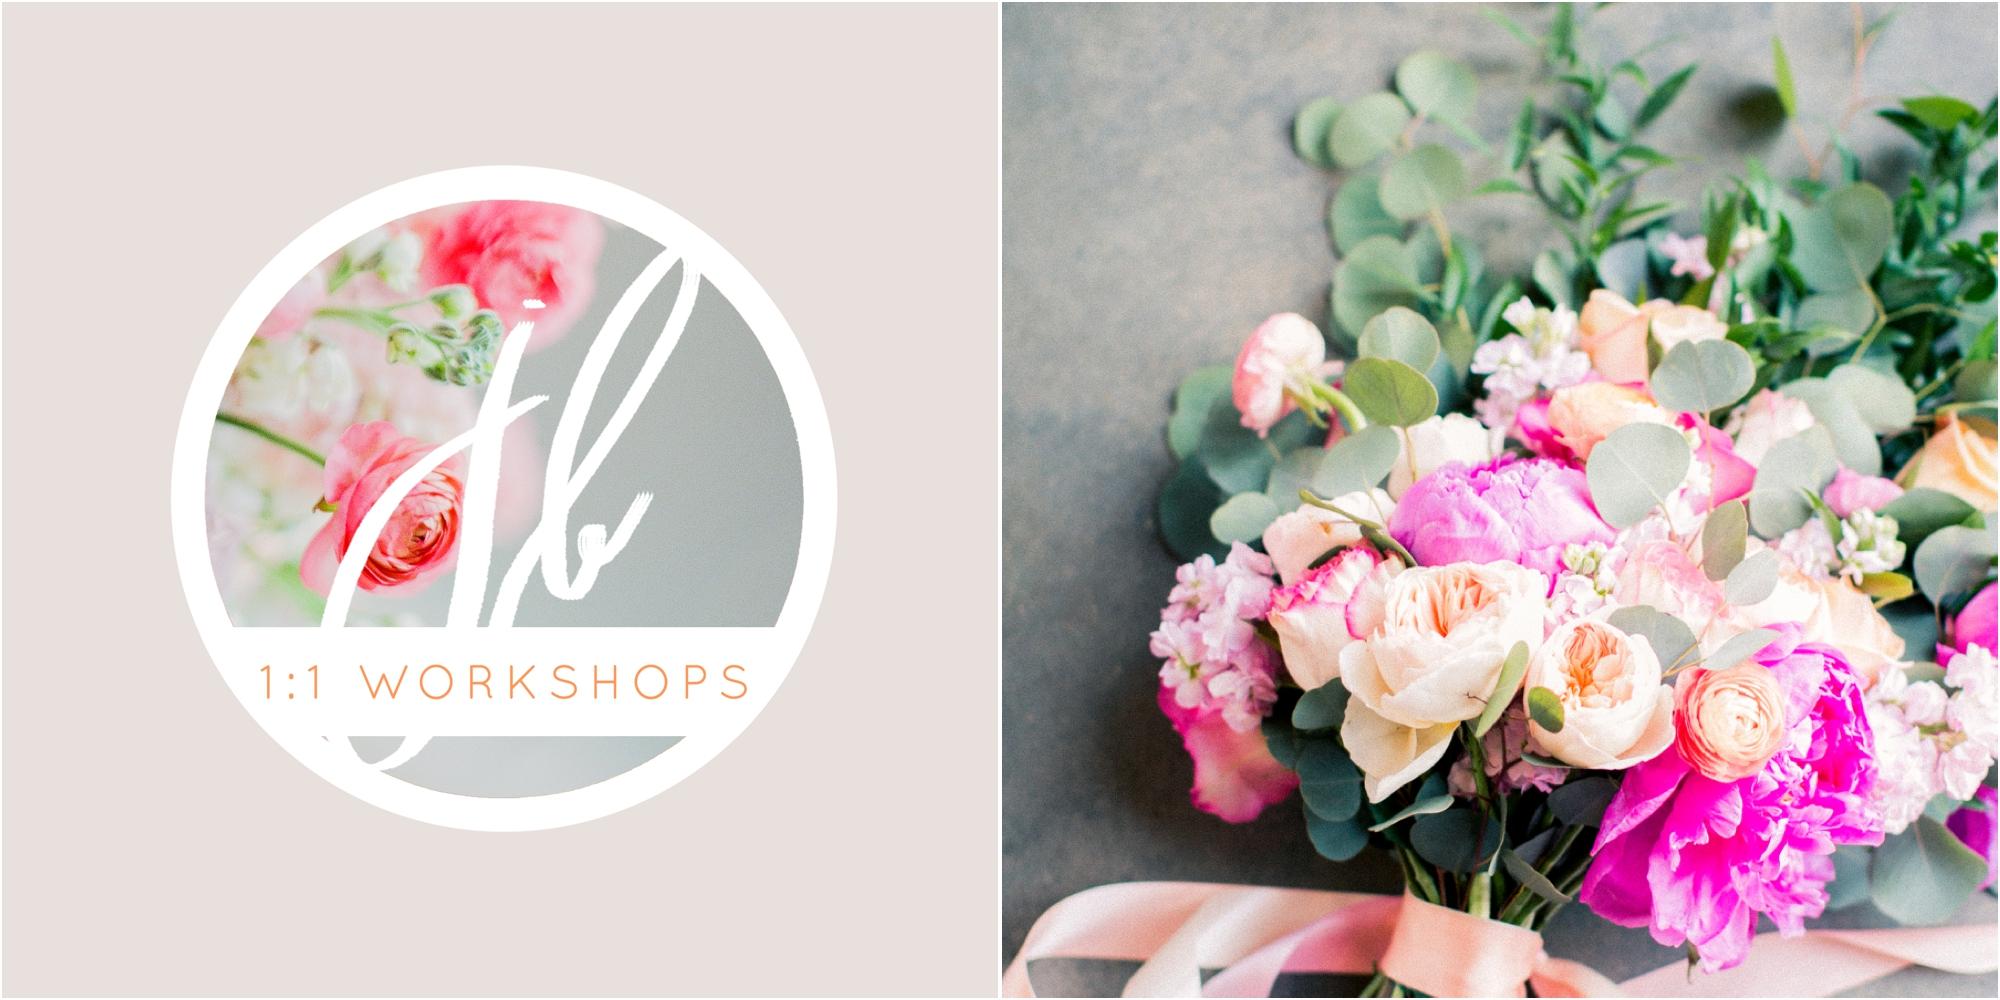 Jordan Brittley 1 on 1 workshops - For the Photographer